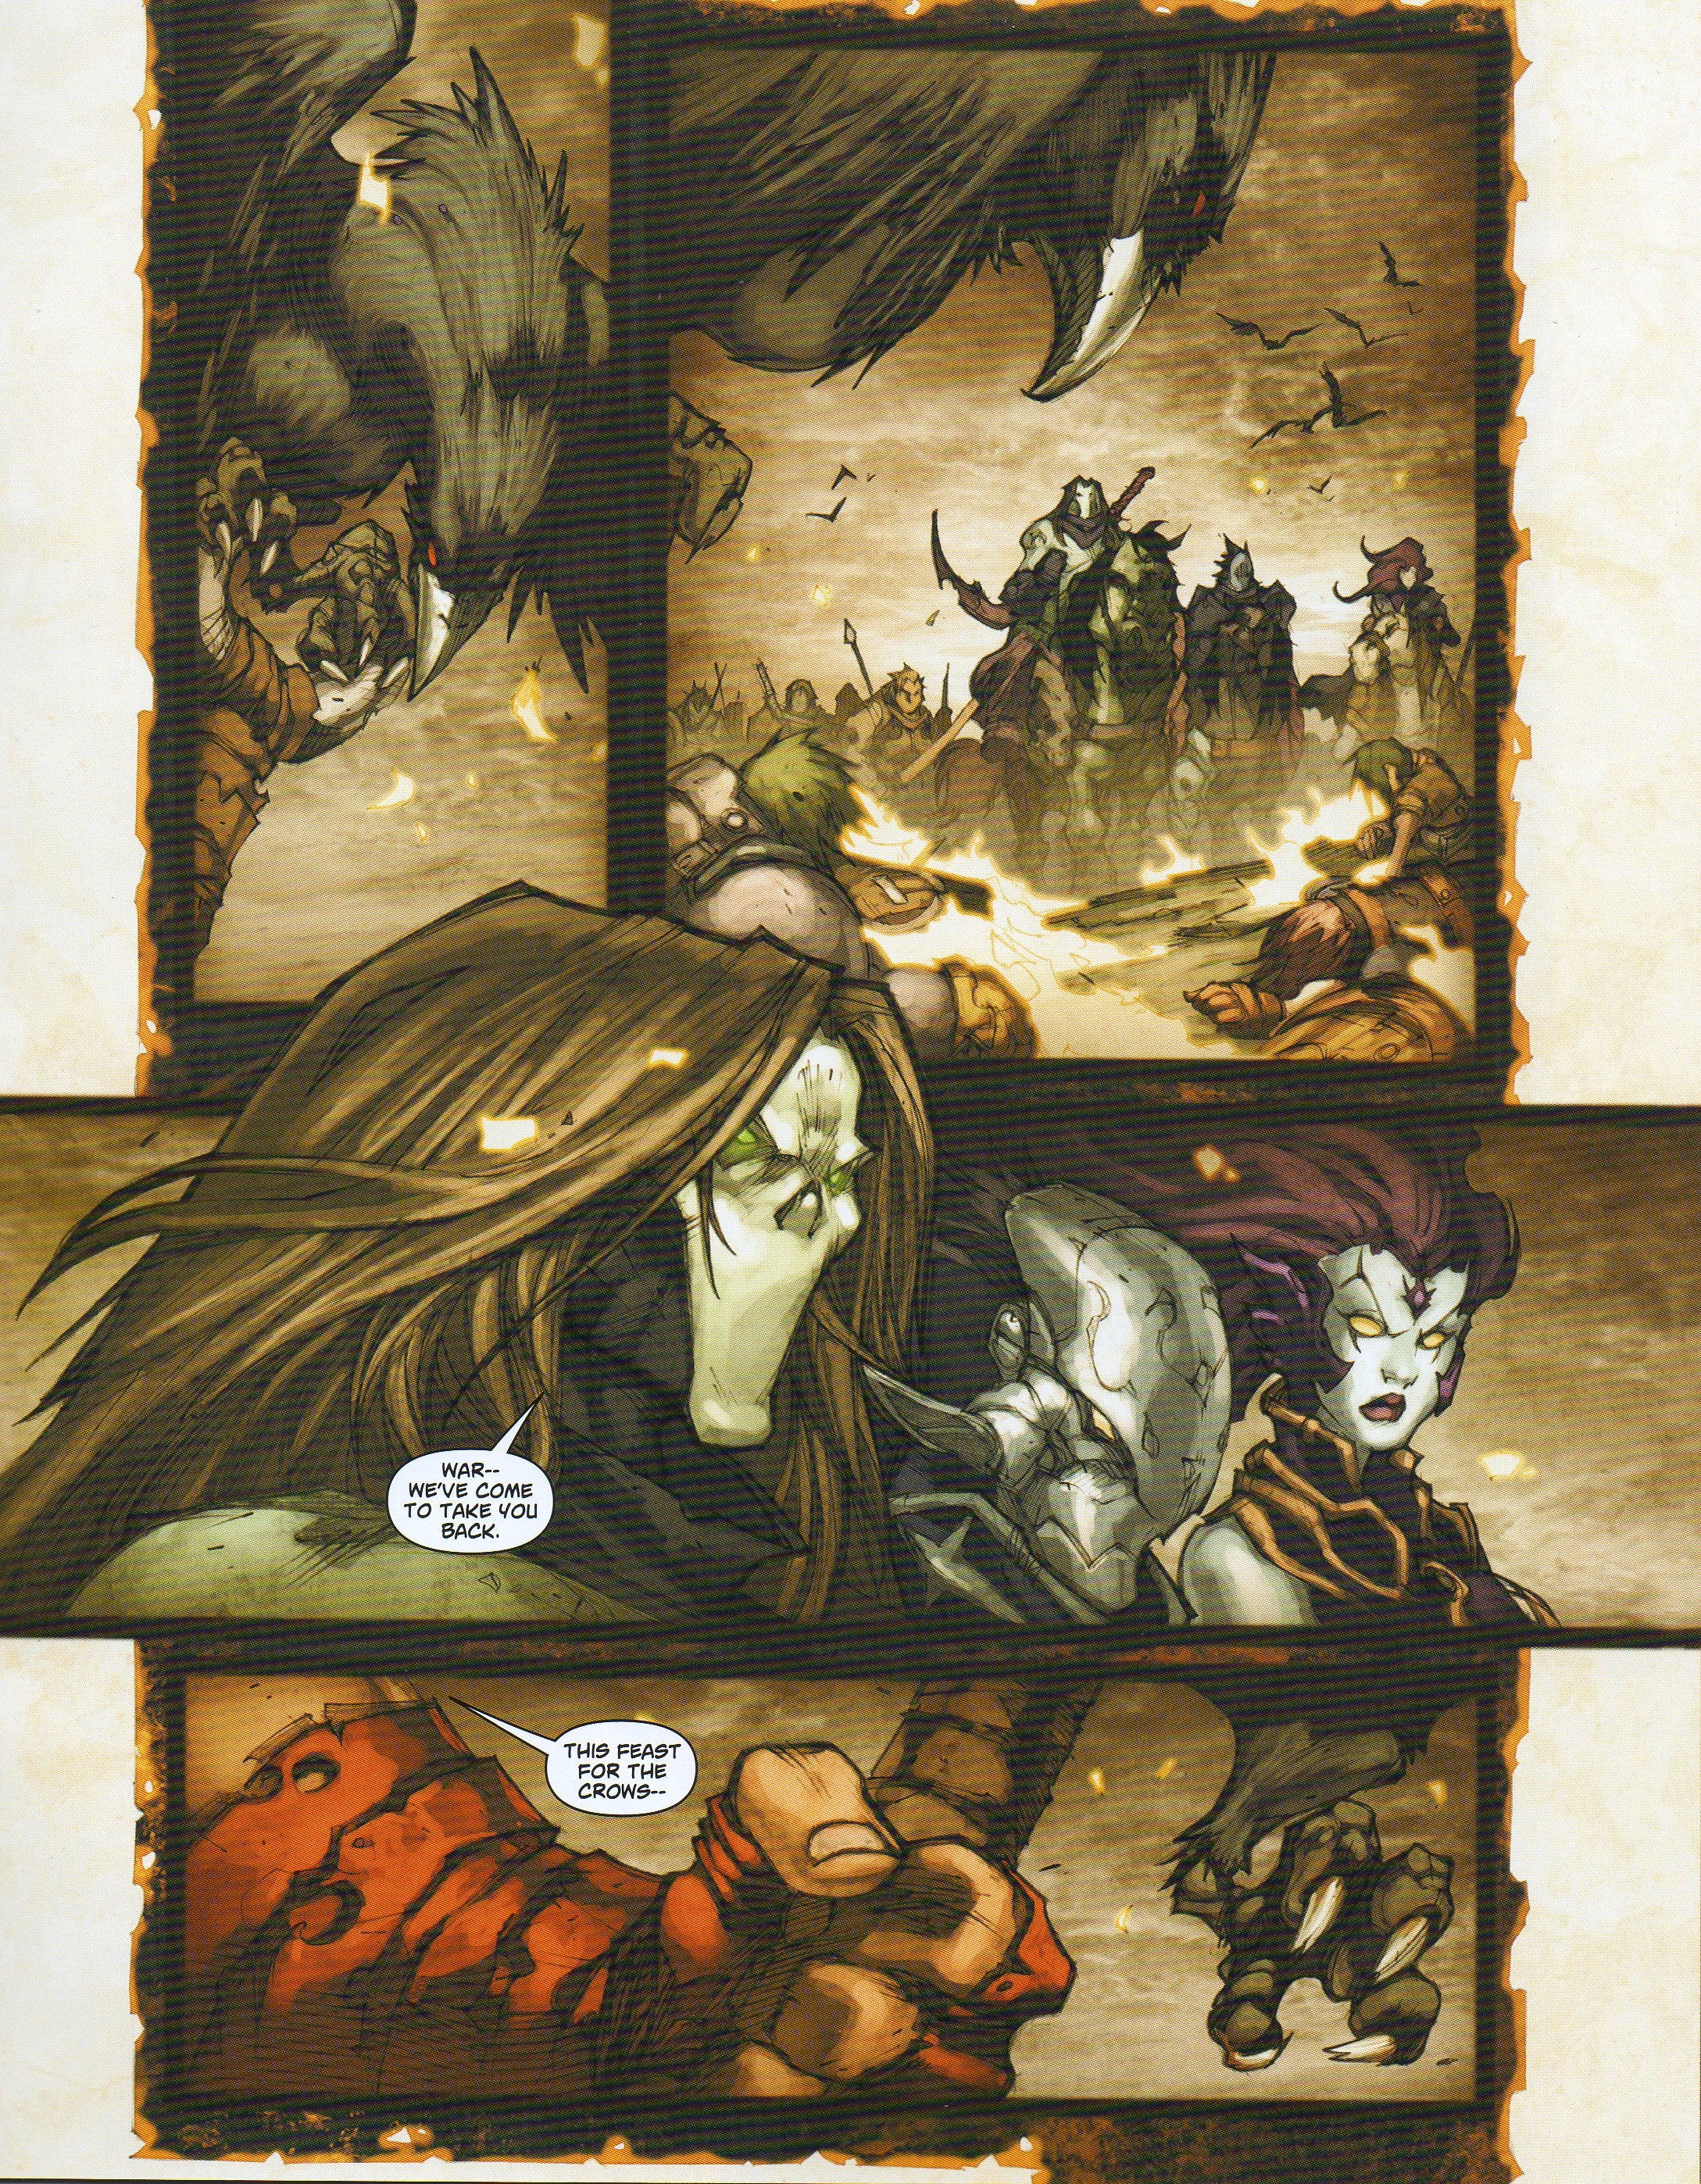 Read online Darksiders comic -  Issue # Full - 9